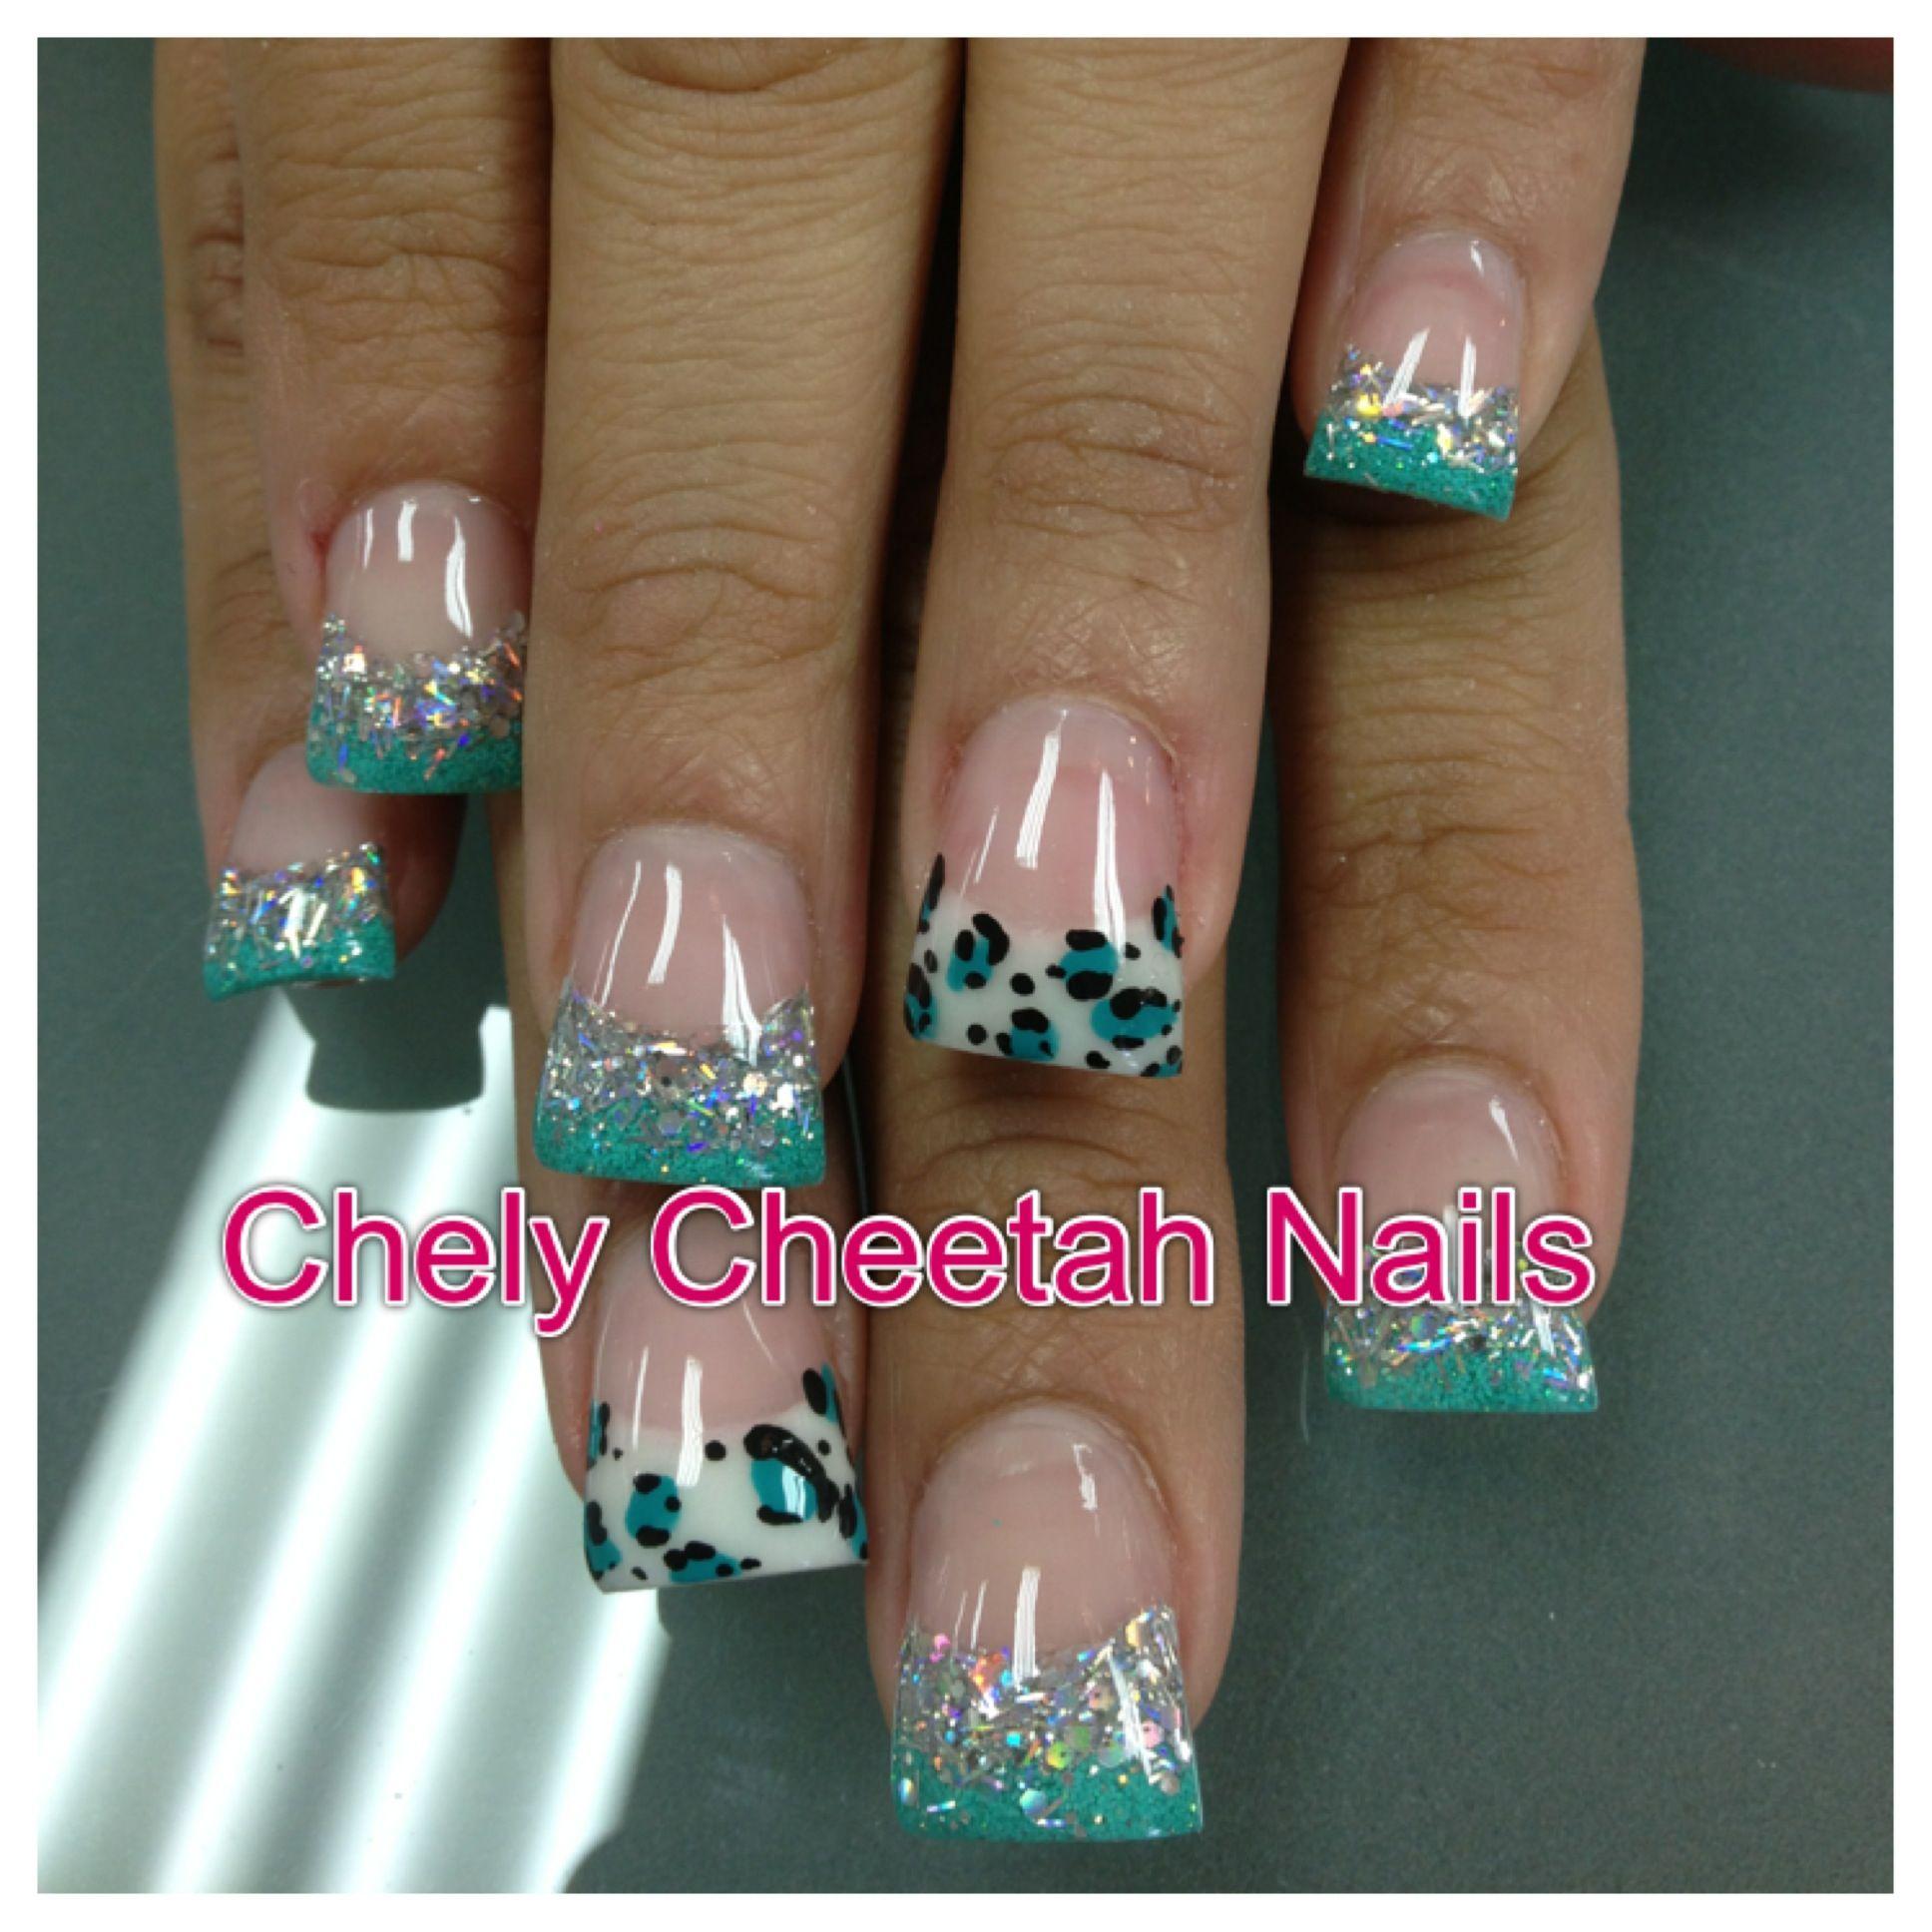 Chely Cheetah Nails. Acrylic nails. Turquoise cheetah rockstar duck ...